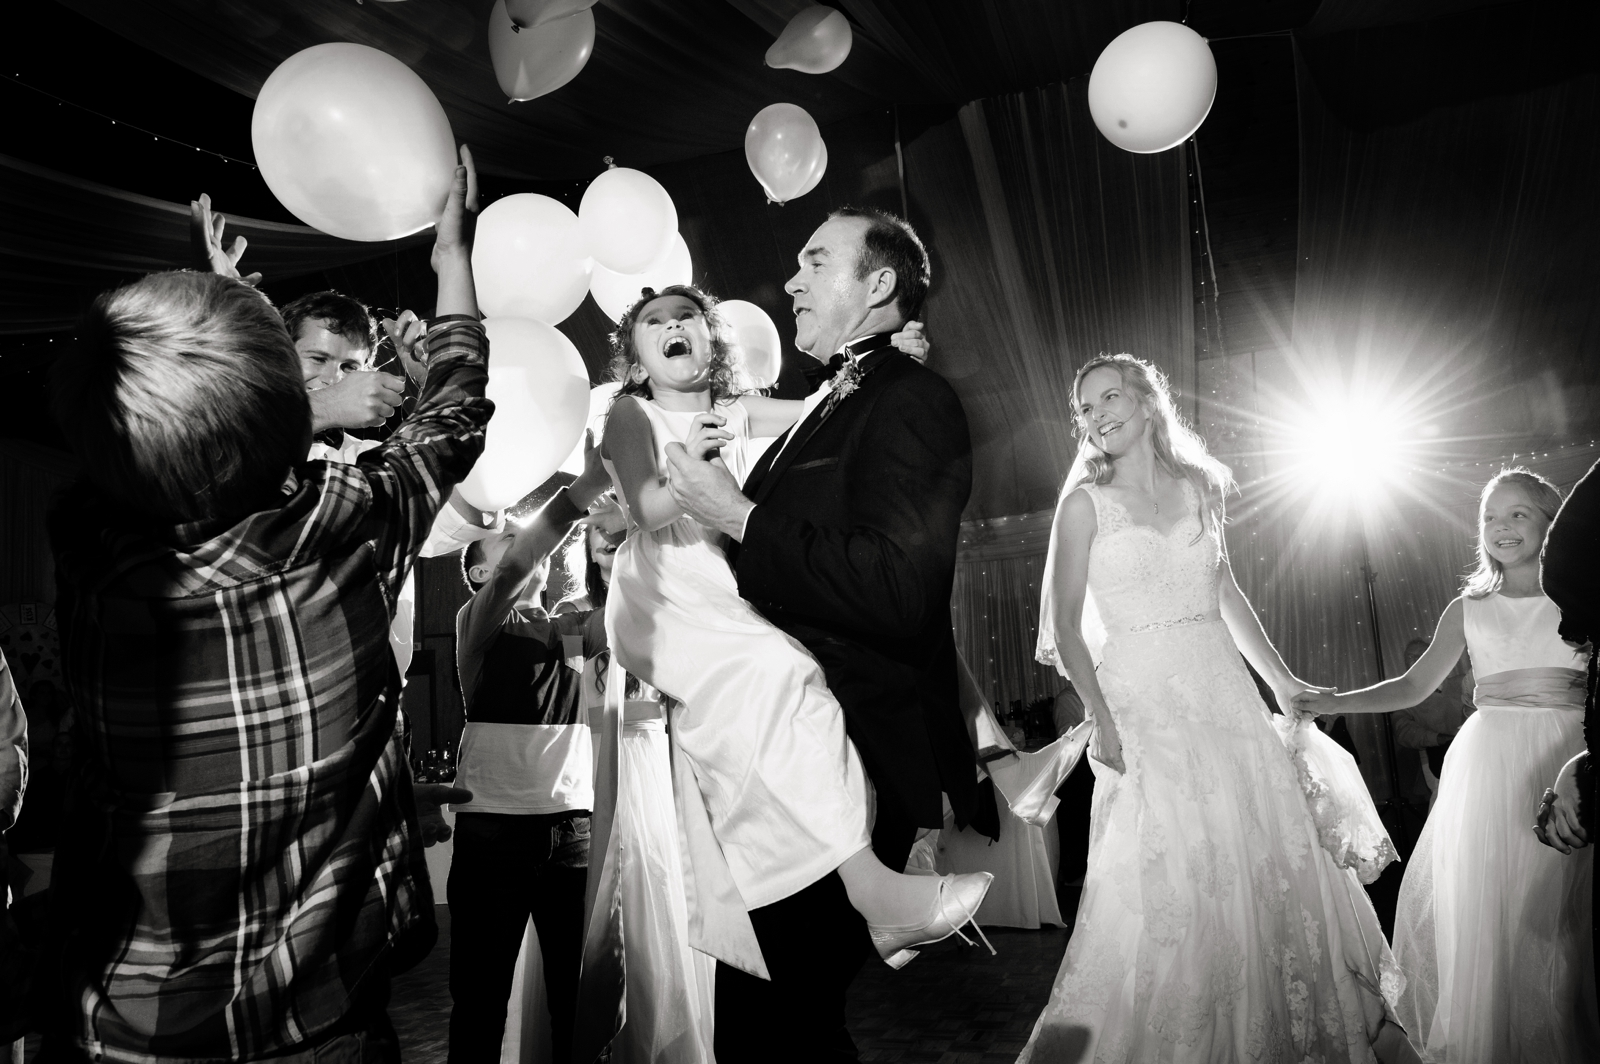 balloon dancing